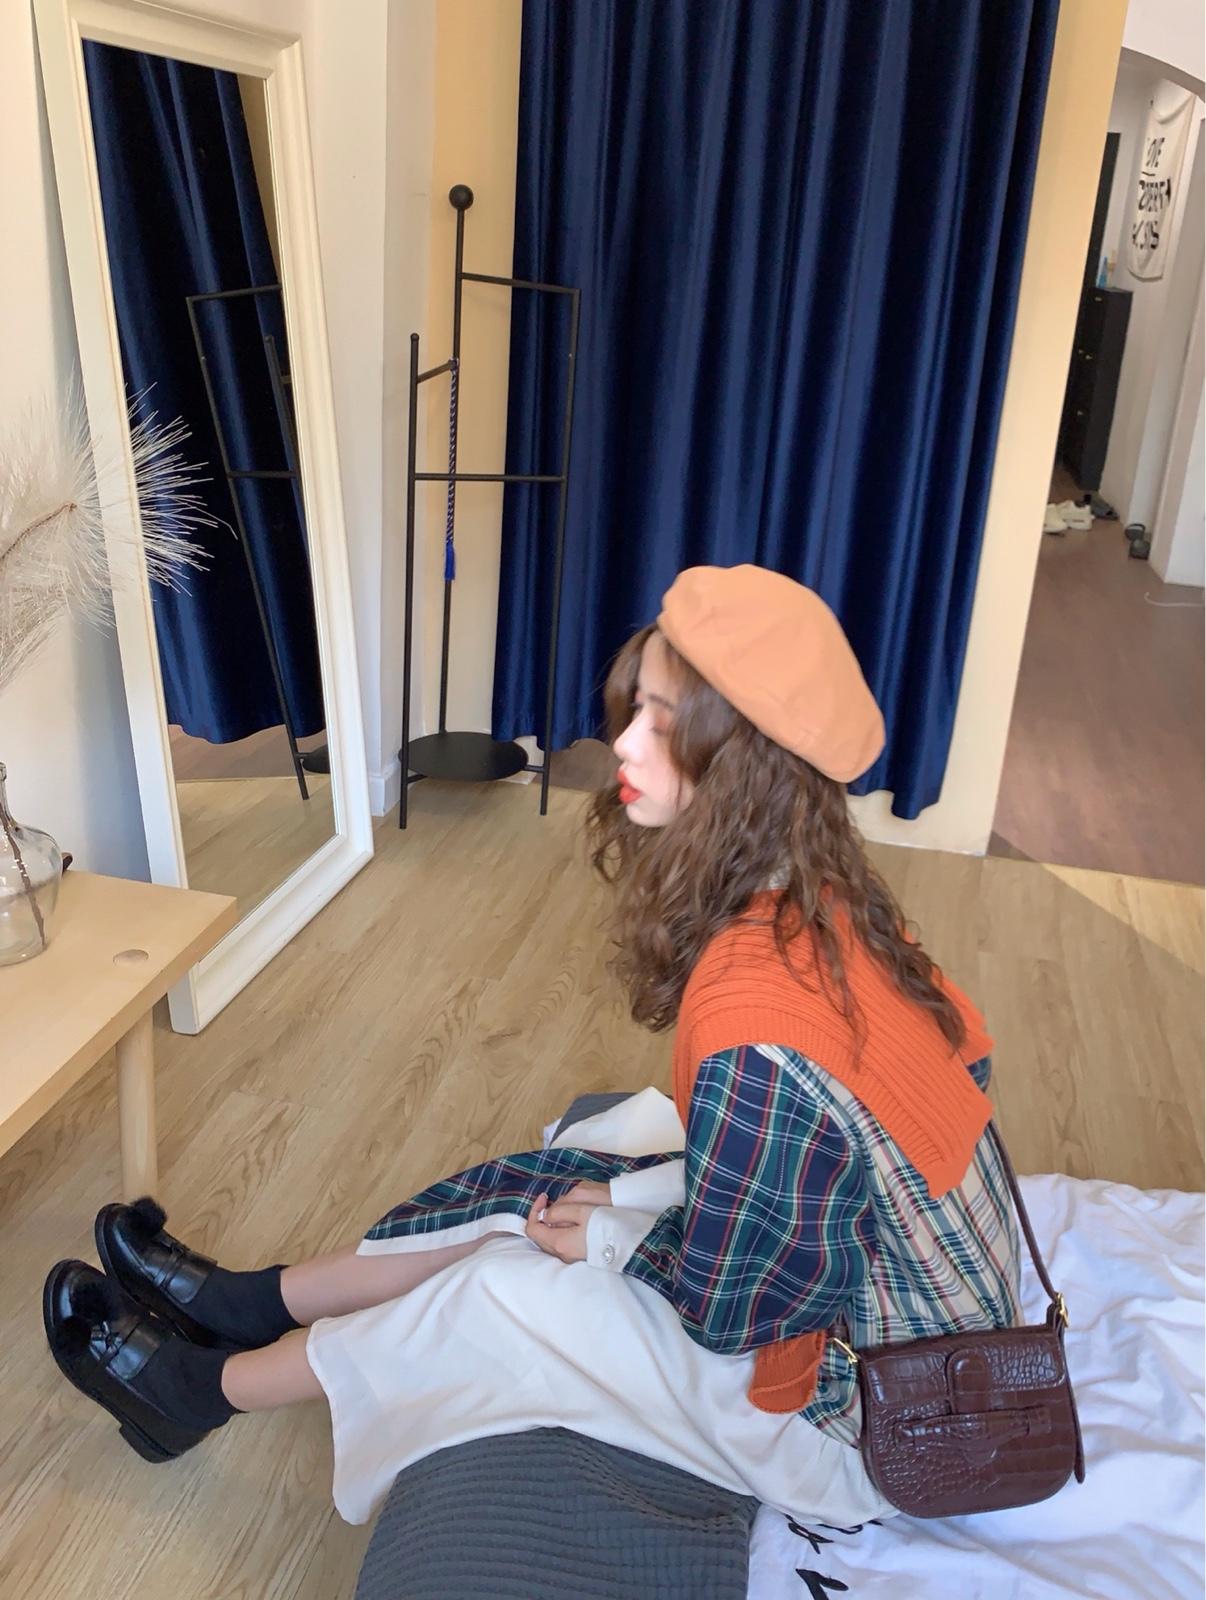 PINKMOON/自制三色格子拼接衬衣连衣裙女 复古女孩bi备秋